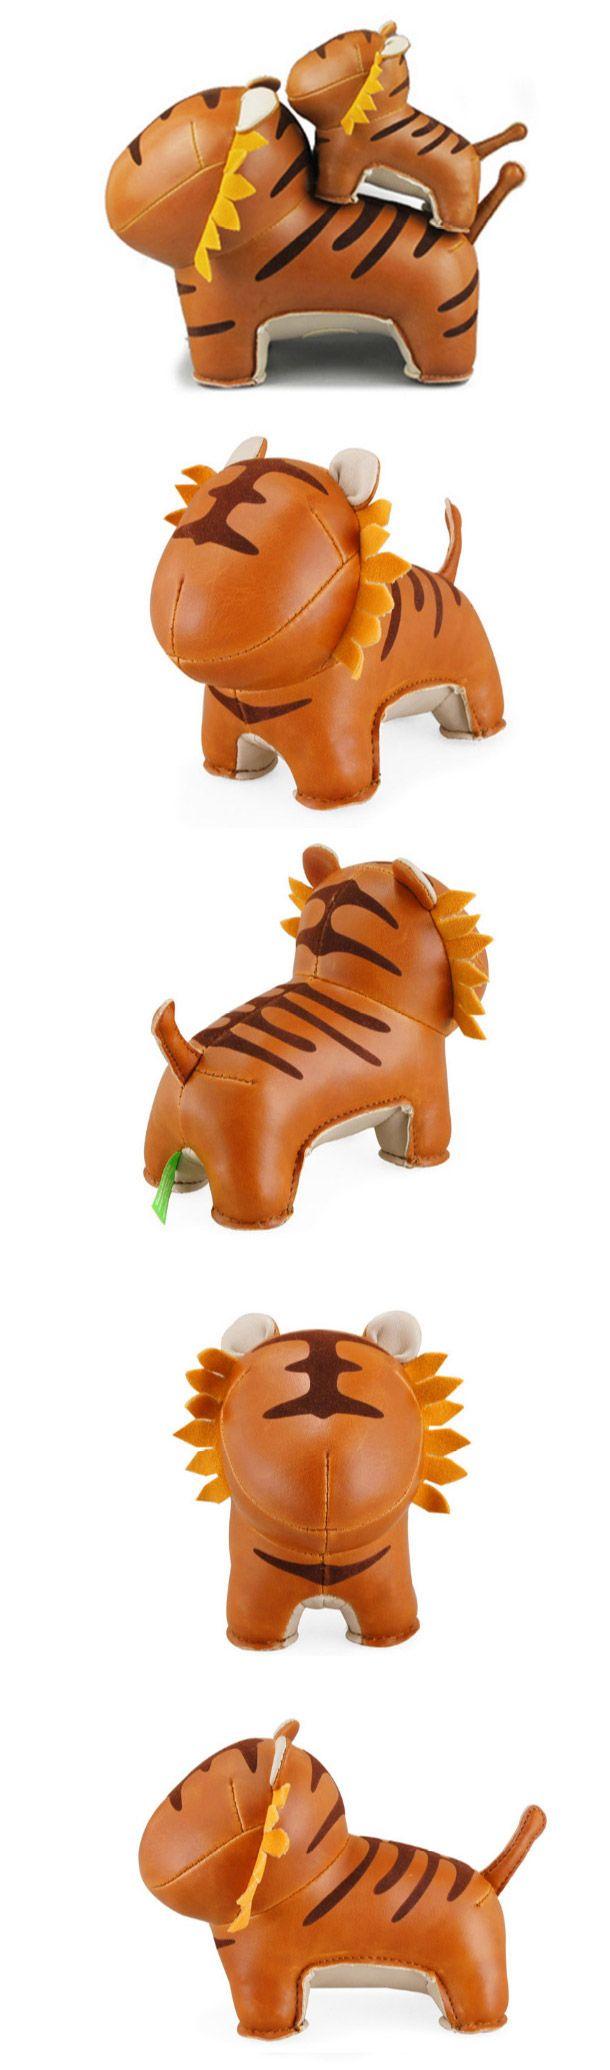 Handmade Cute Animal Leather Stuffed Tiger Home Decoration